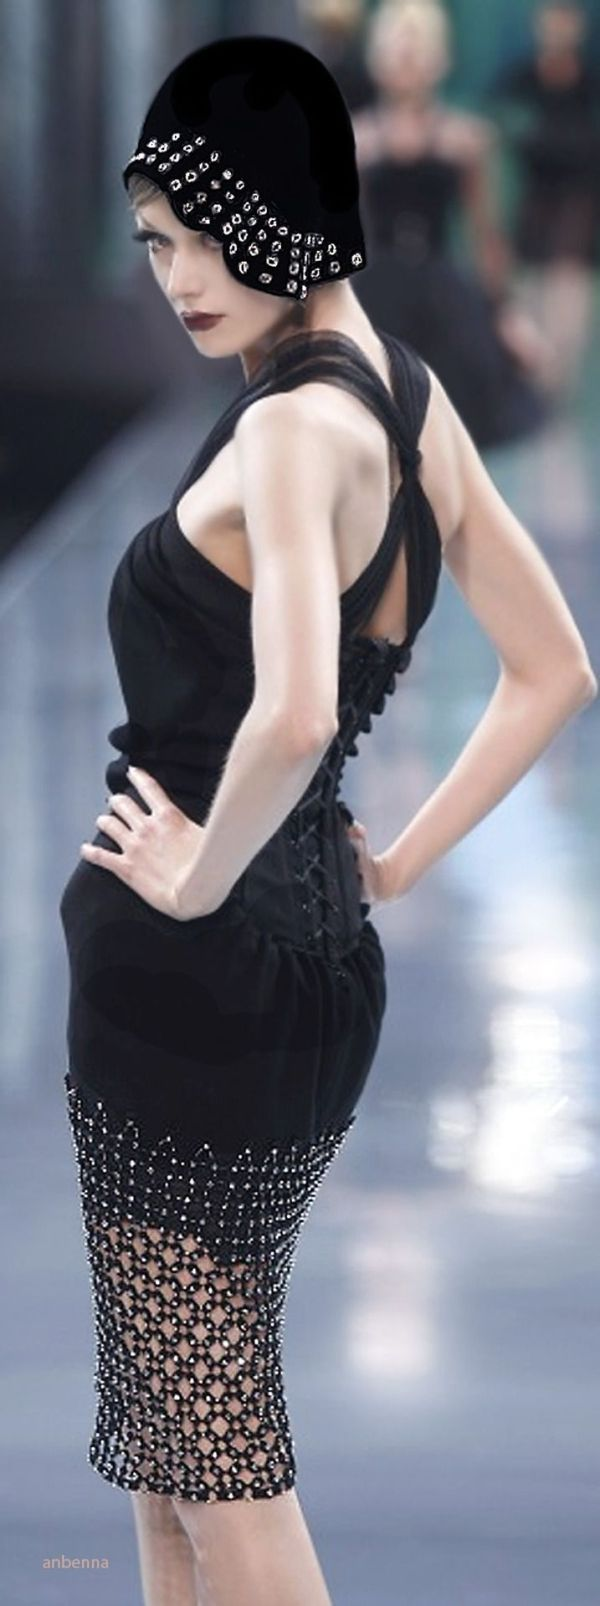 Christian Dior | silver rivets detail | modern & vintage Art Deco style black hat & little black dress